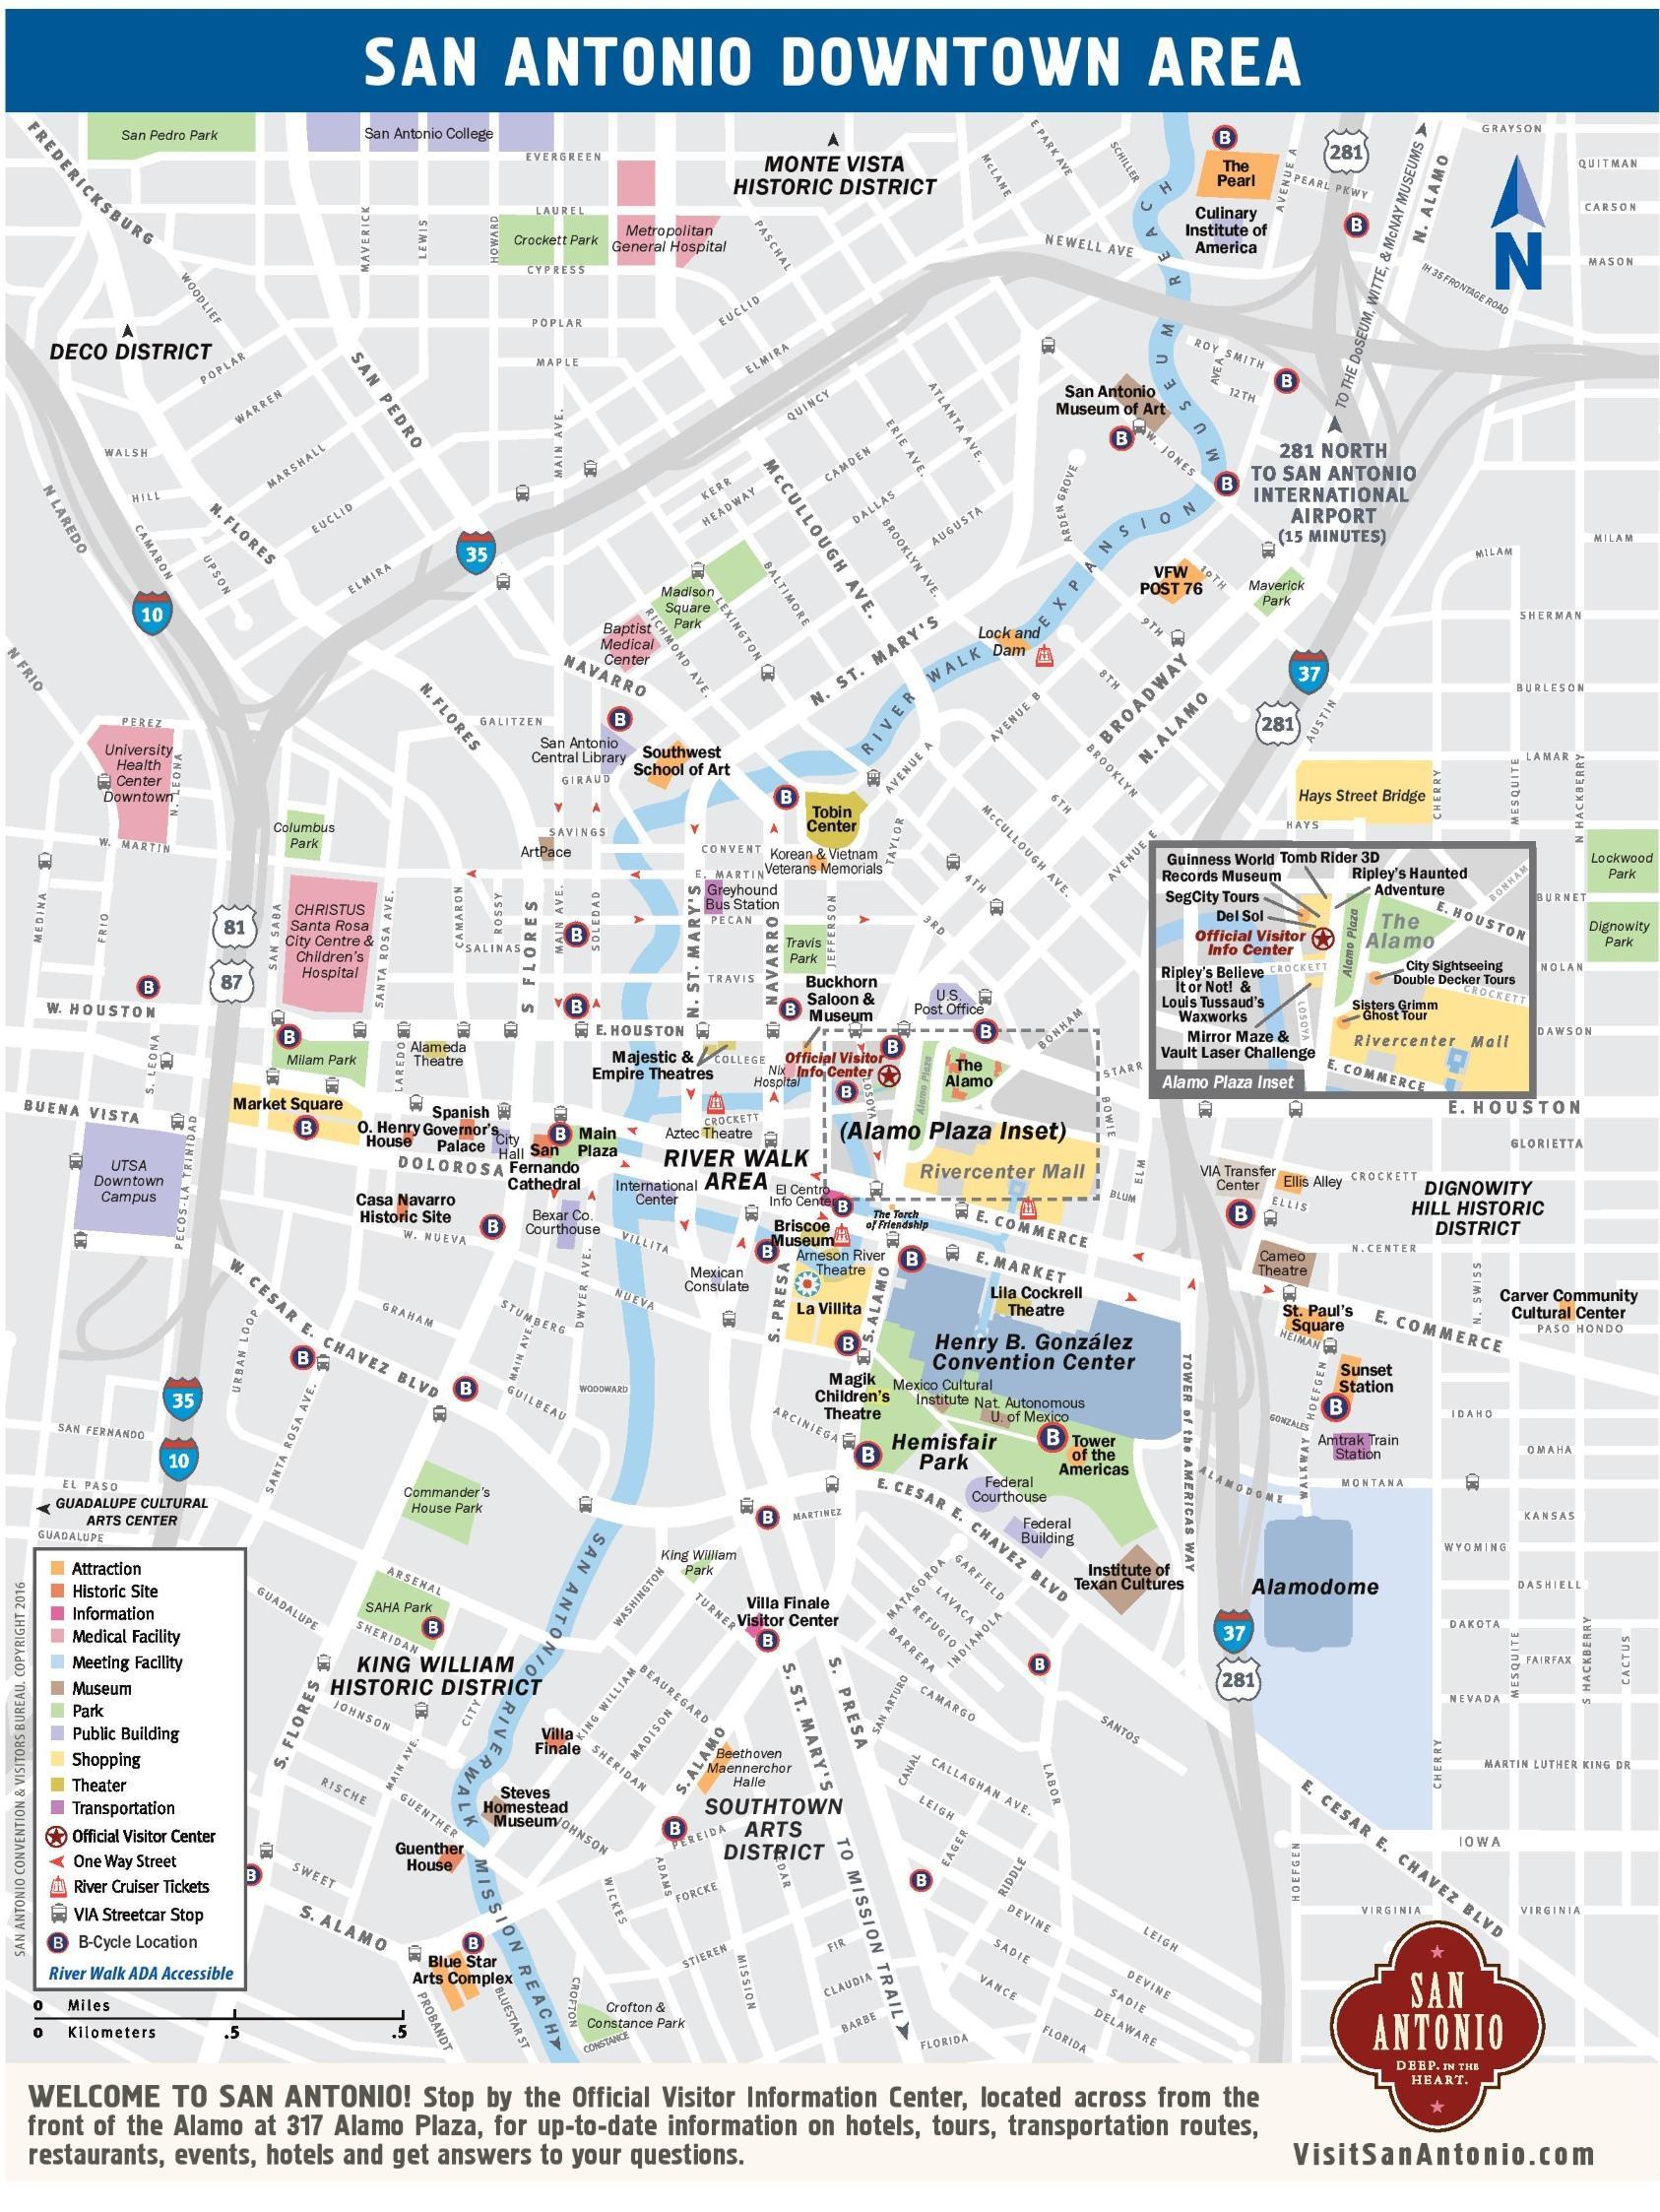 San Antonio Street Map - Carte De Rue De San Antonio Au Texas (Texas - San Antonio Texas Maps